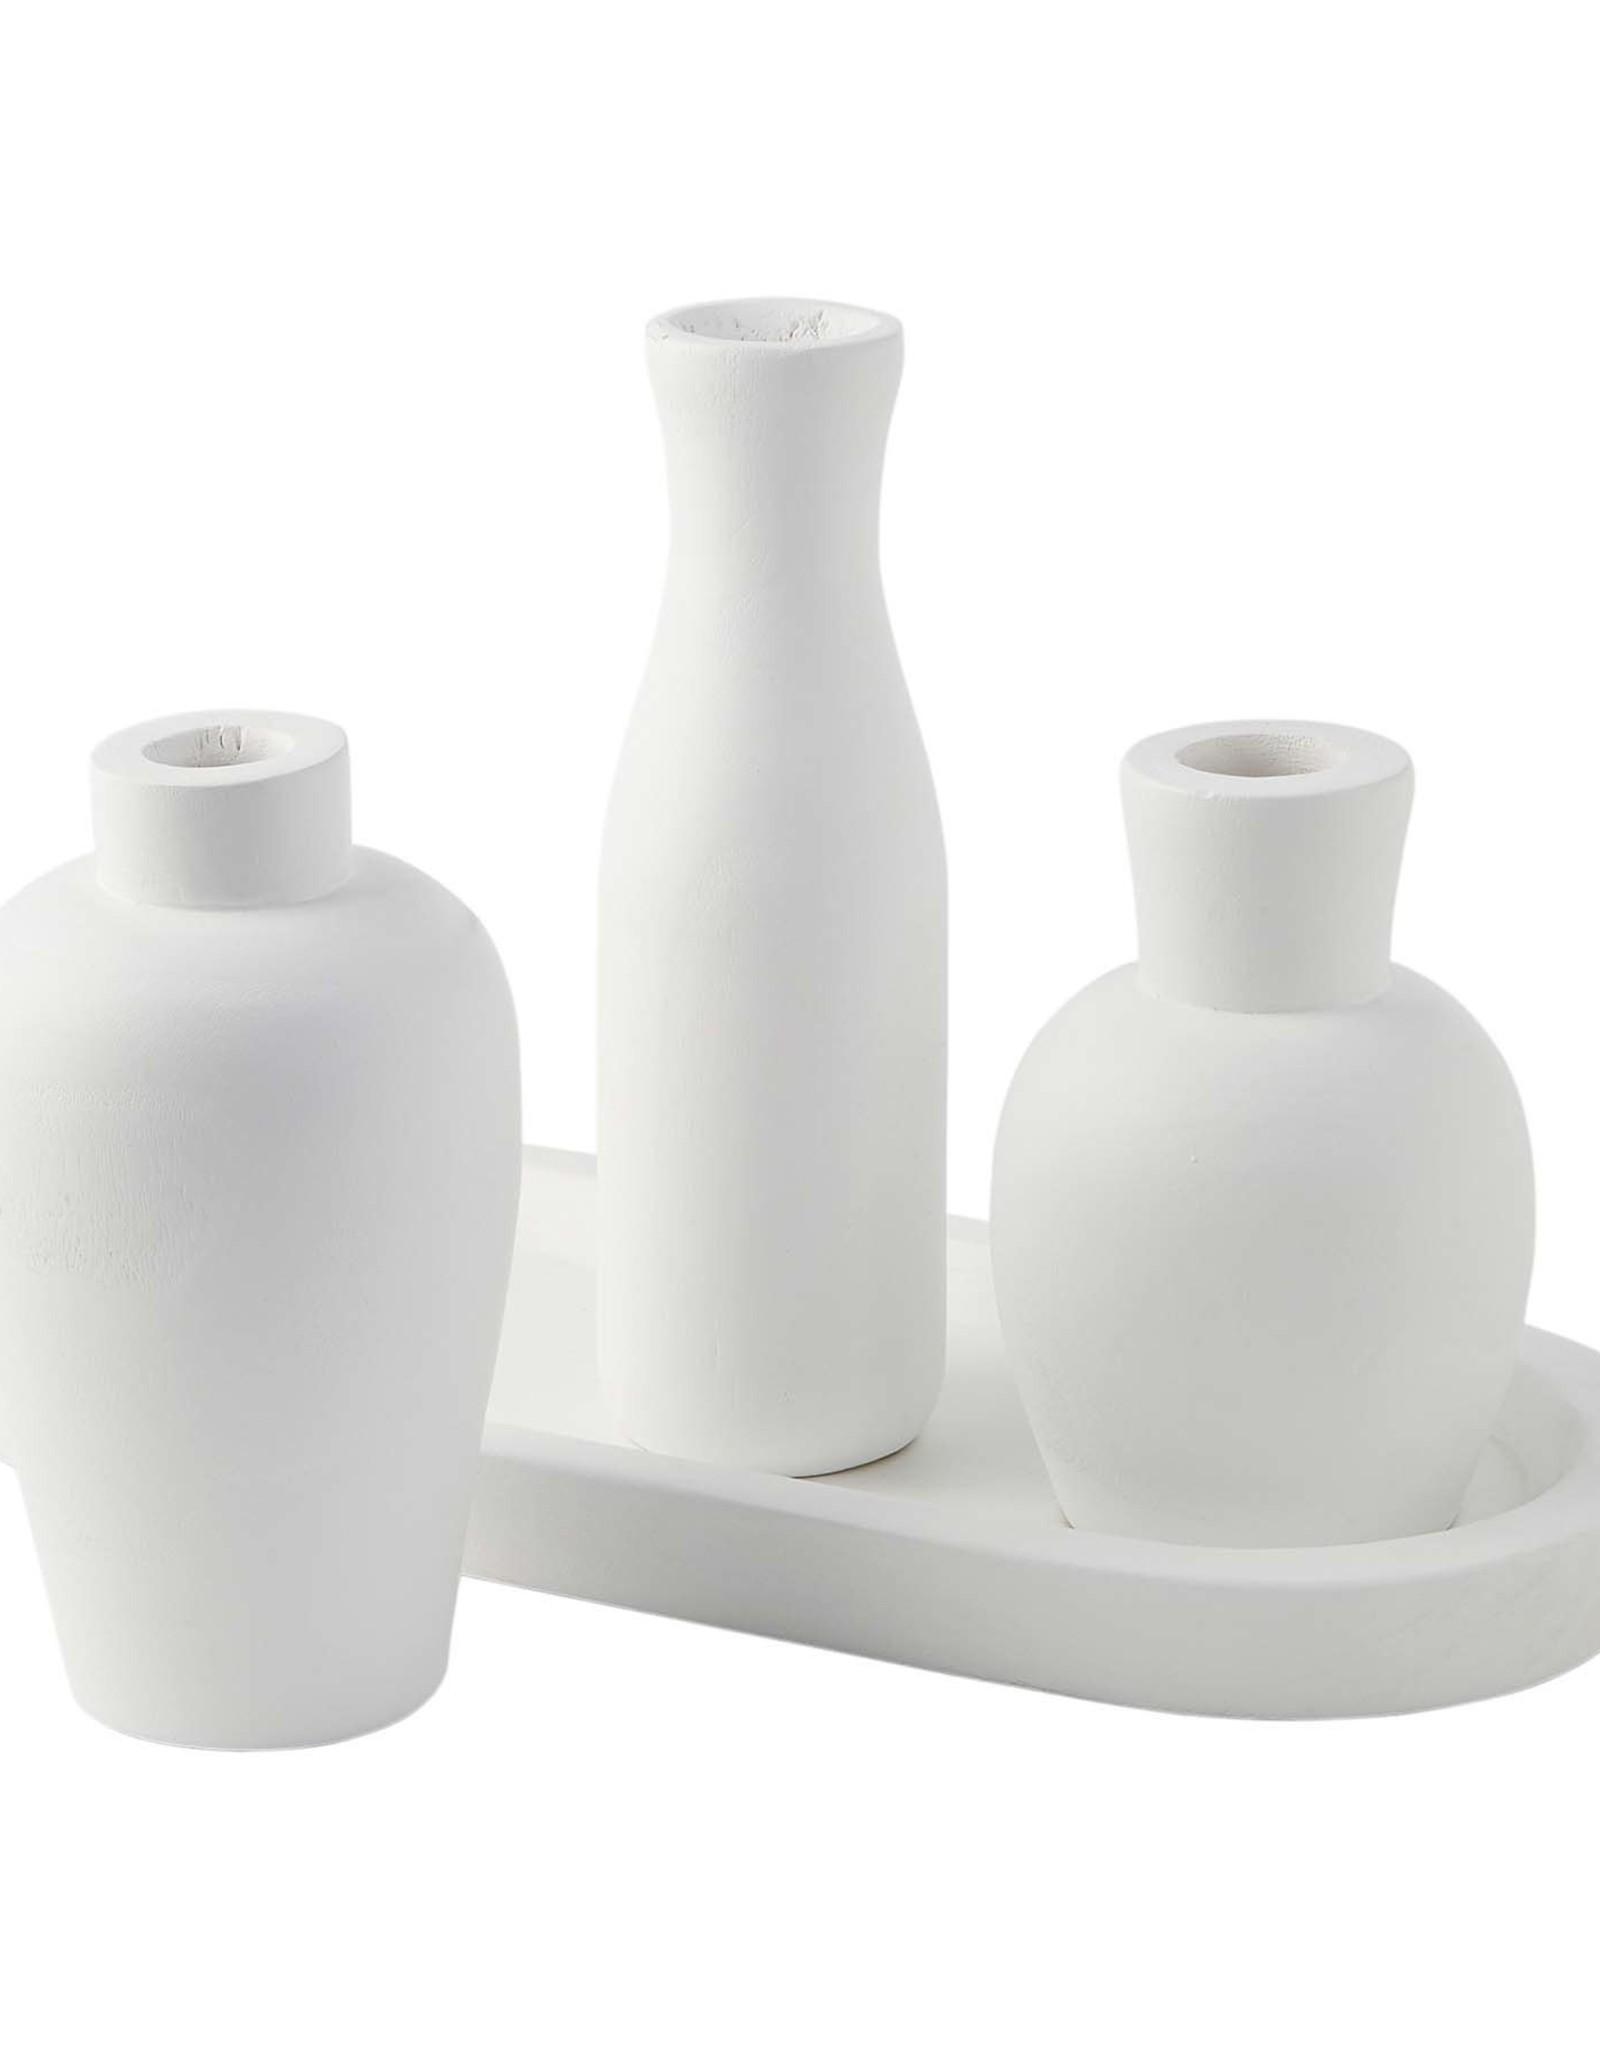 MudPie White Paulownia Tray/Vase Set